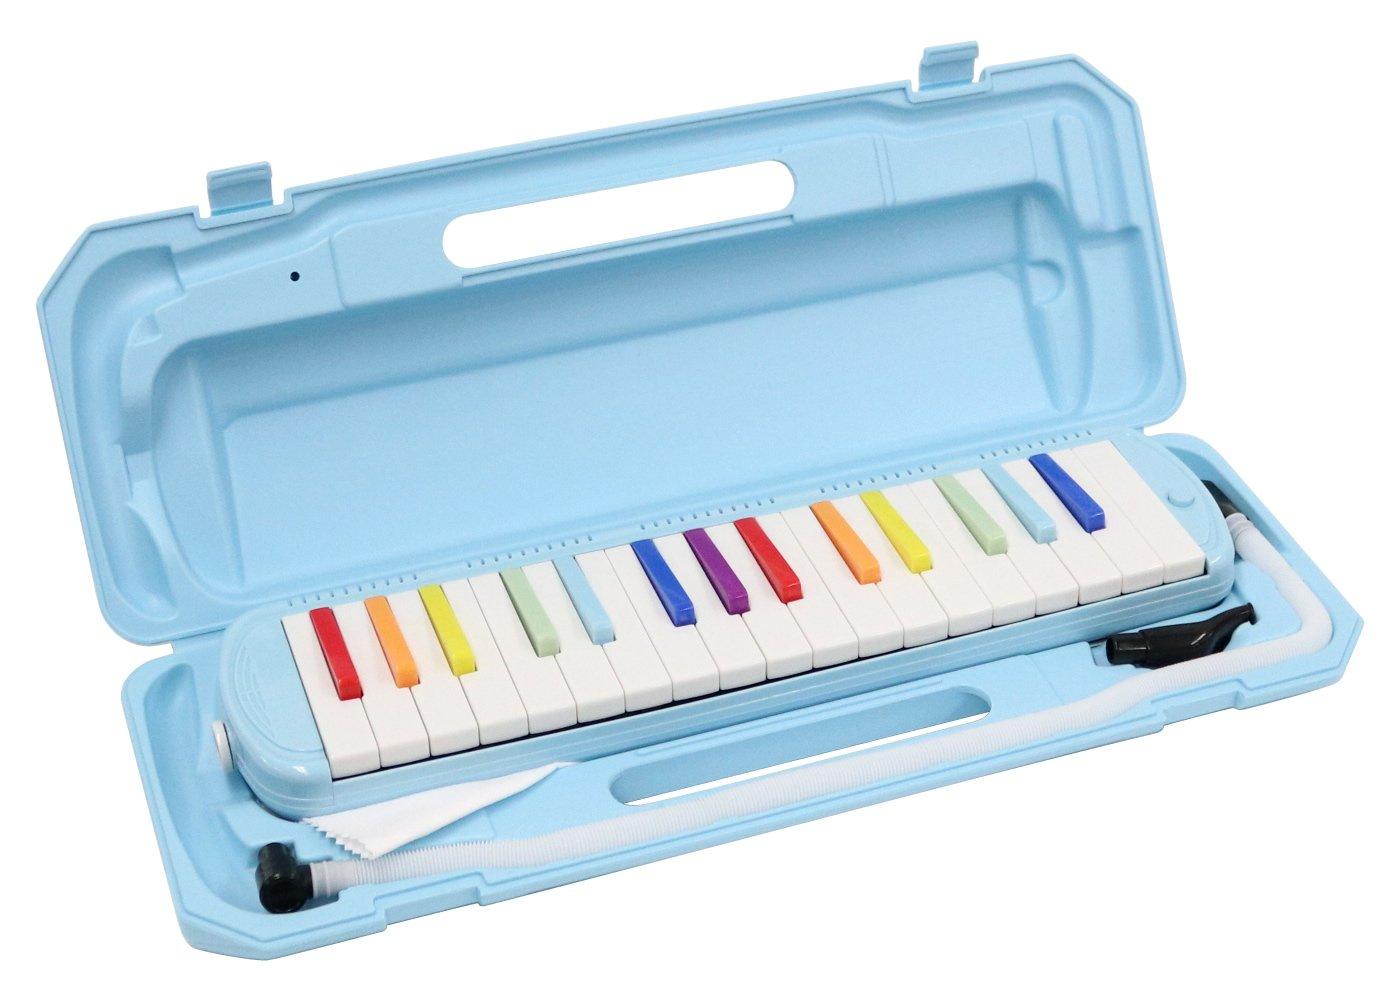 KC 鍵盤ハーモニカ (メロディーピアノ) 虹色 P3001-32K/NIJI